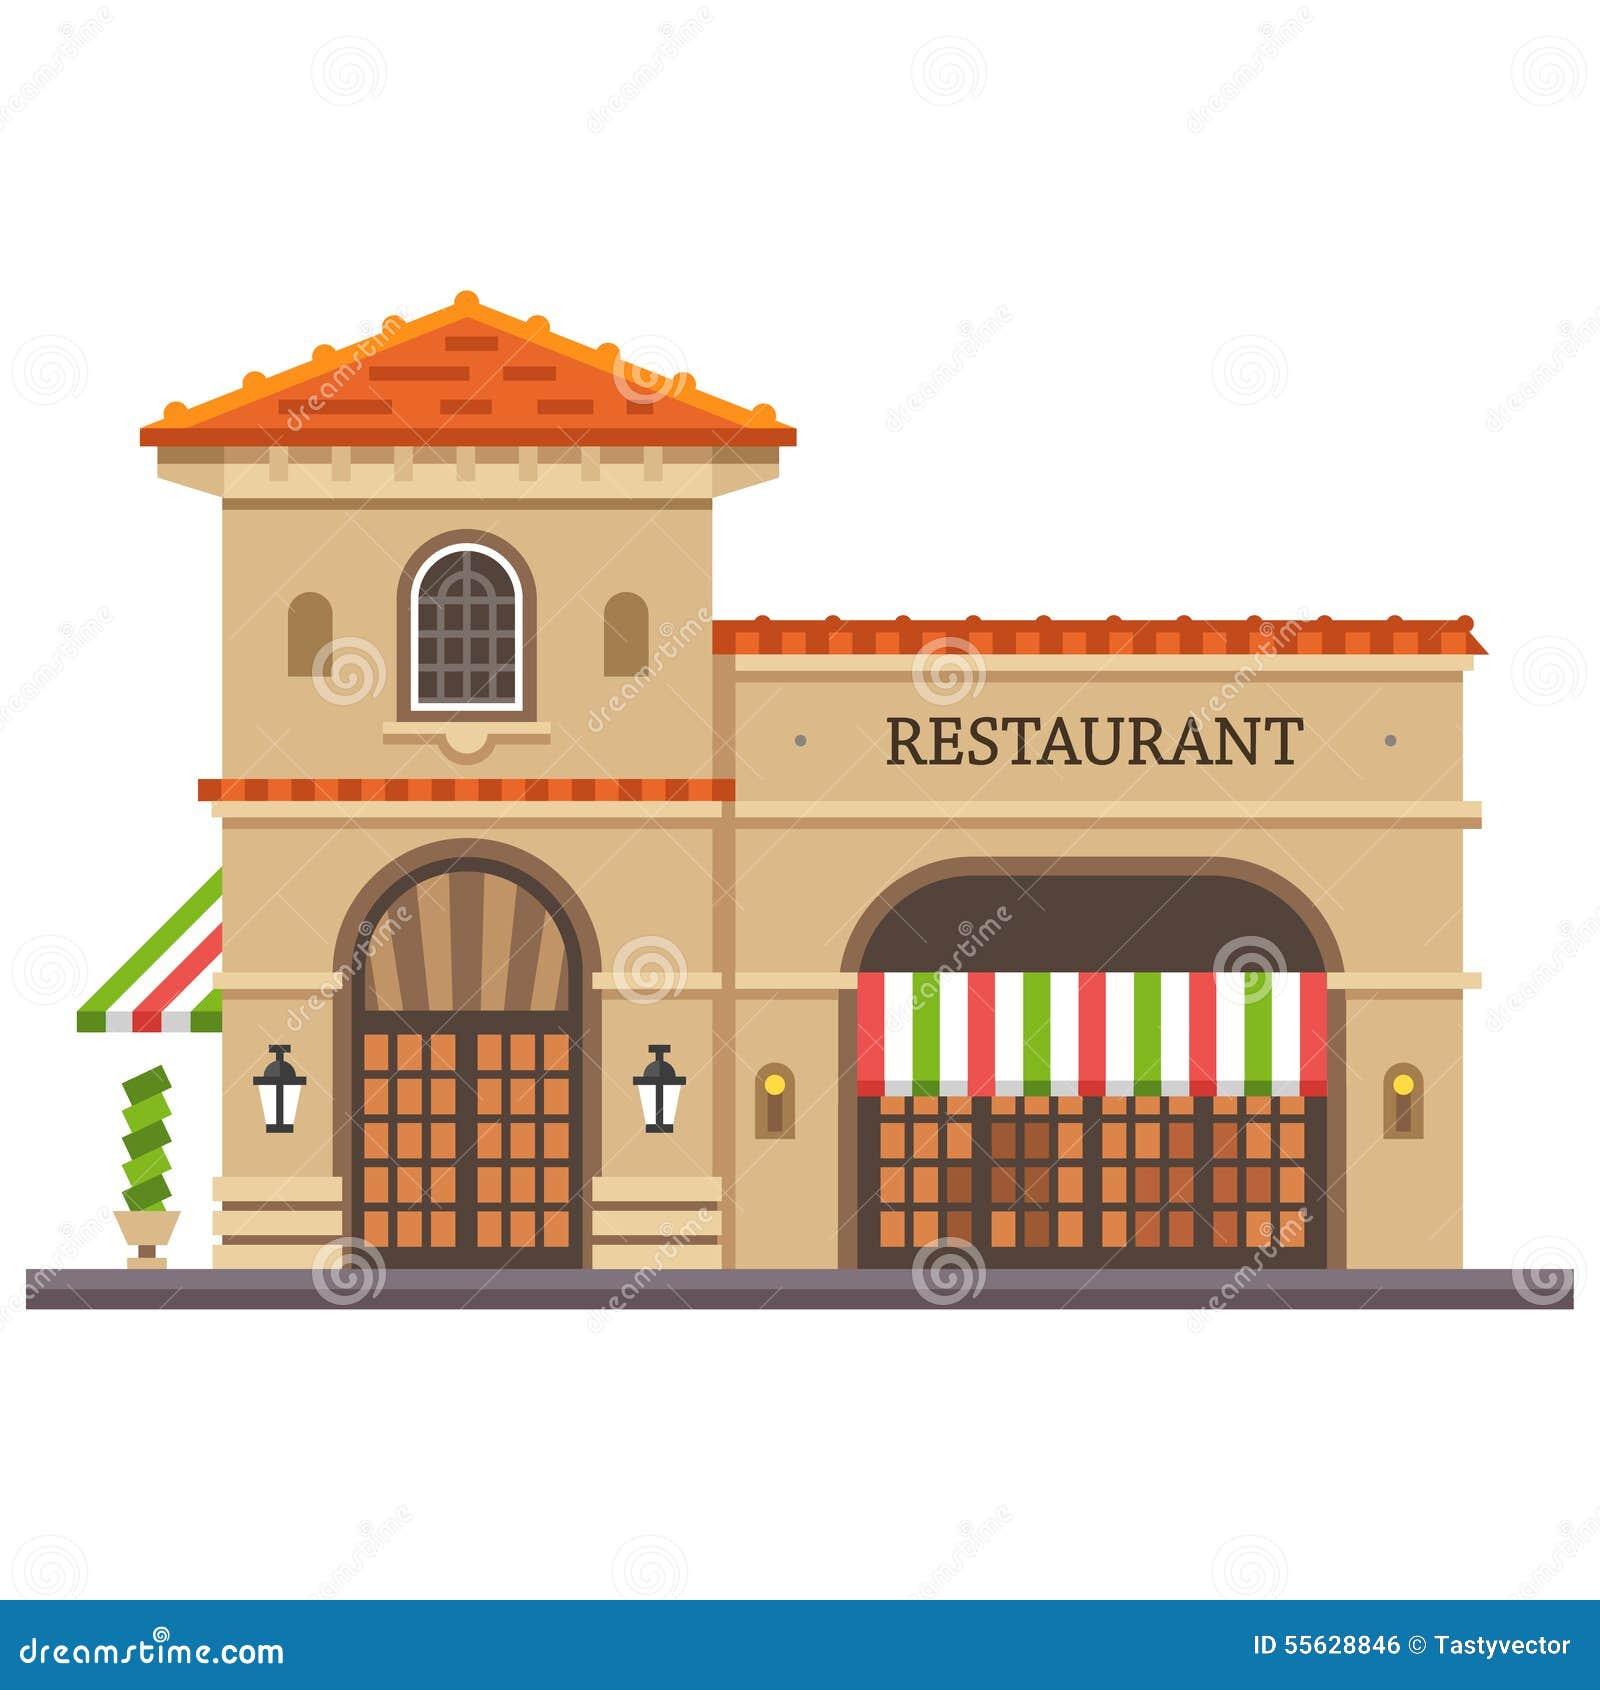 restaurant clipart download - photo #37